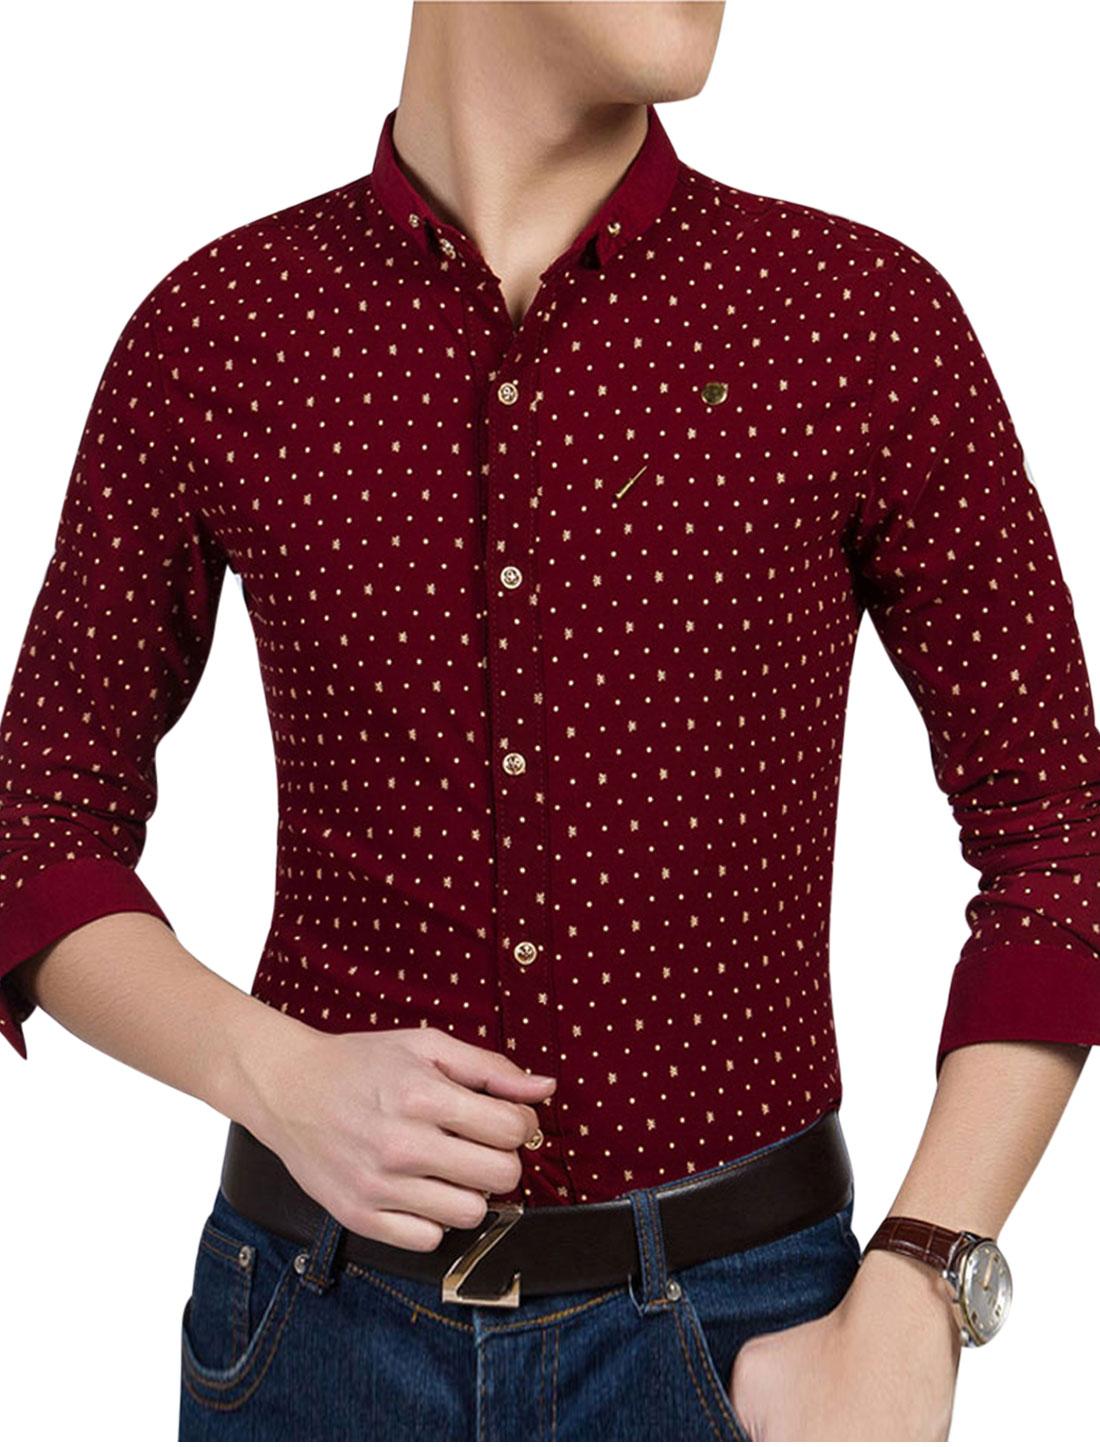 Man Novelty Dots Prints Long Sleeves Slim Fit Casual Shirt w Brooch Bufgundy M